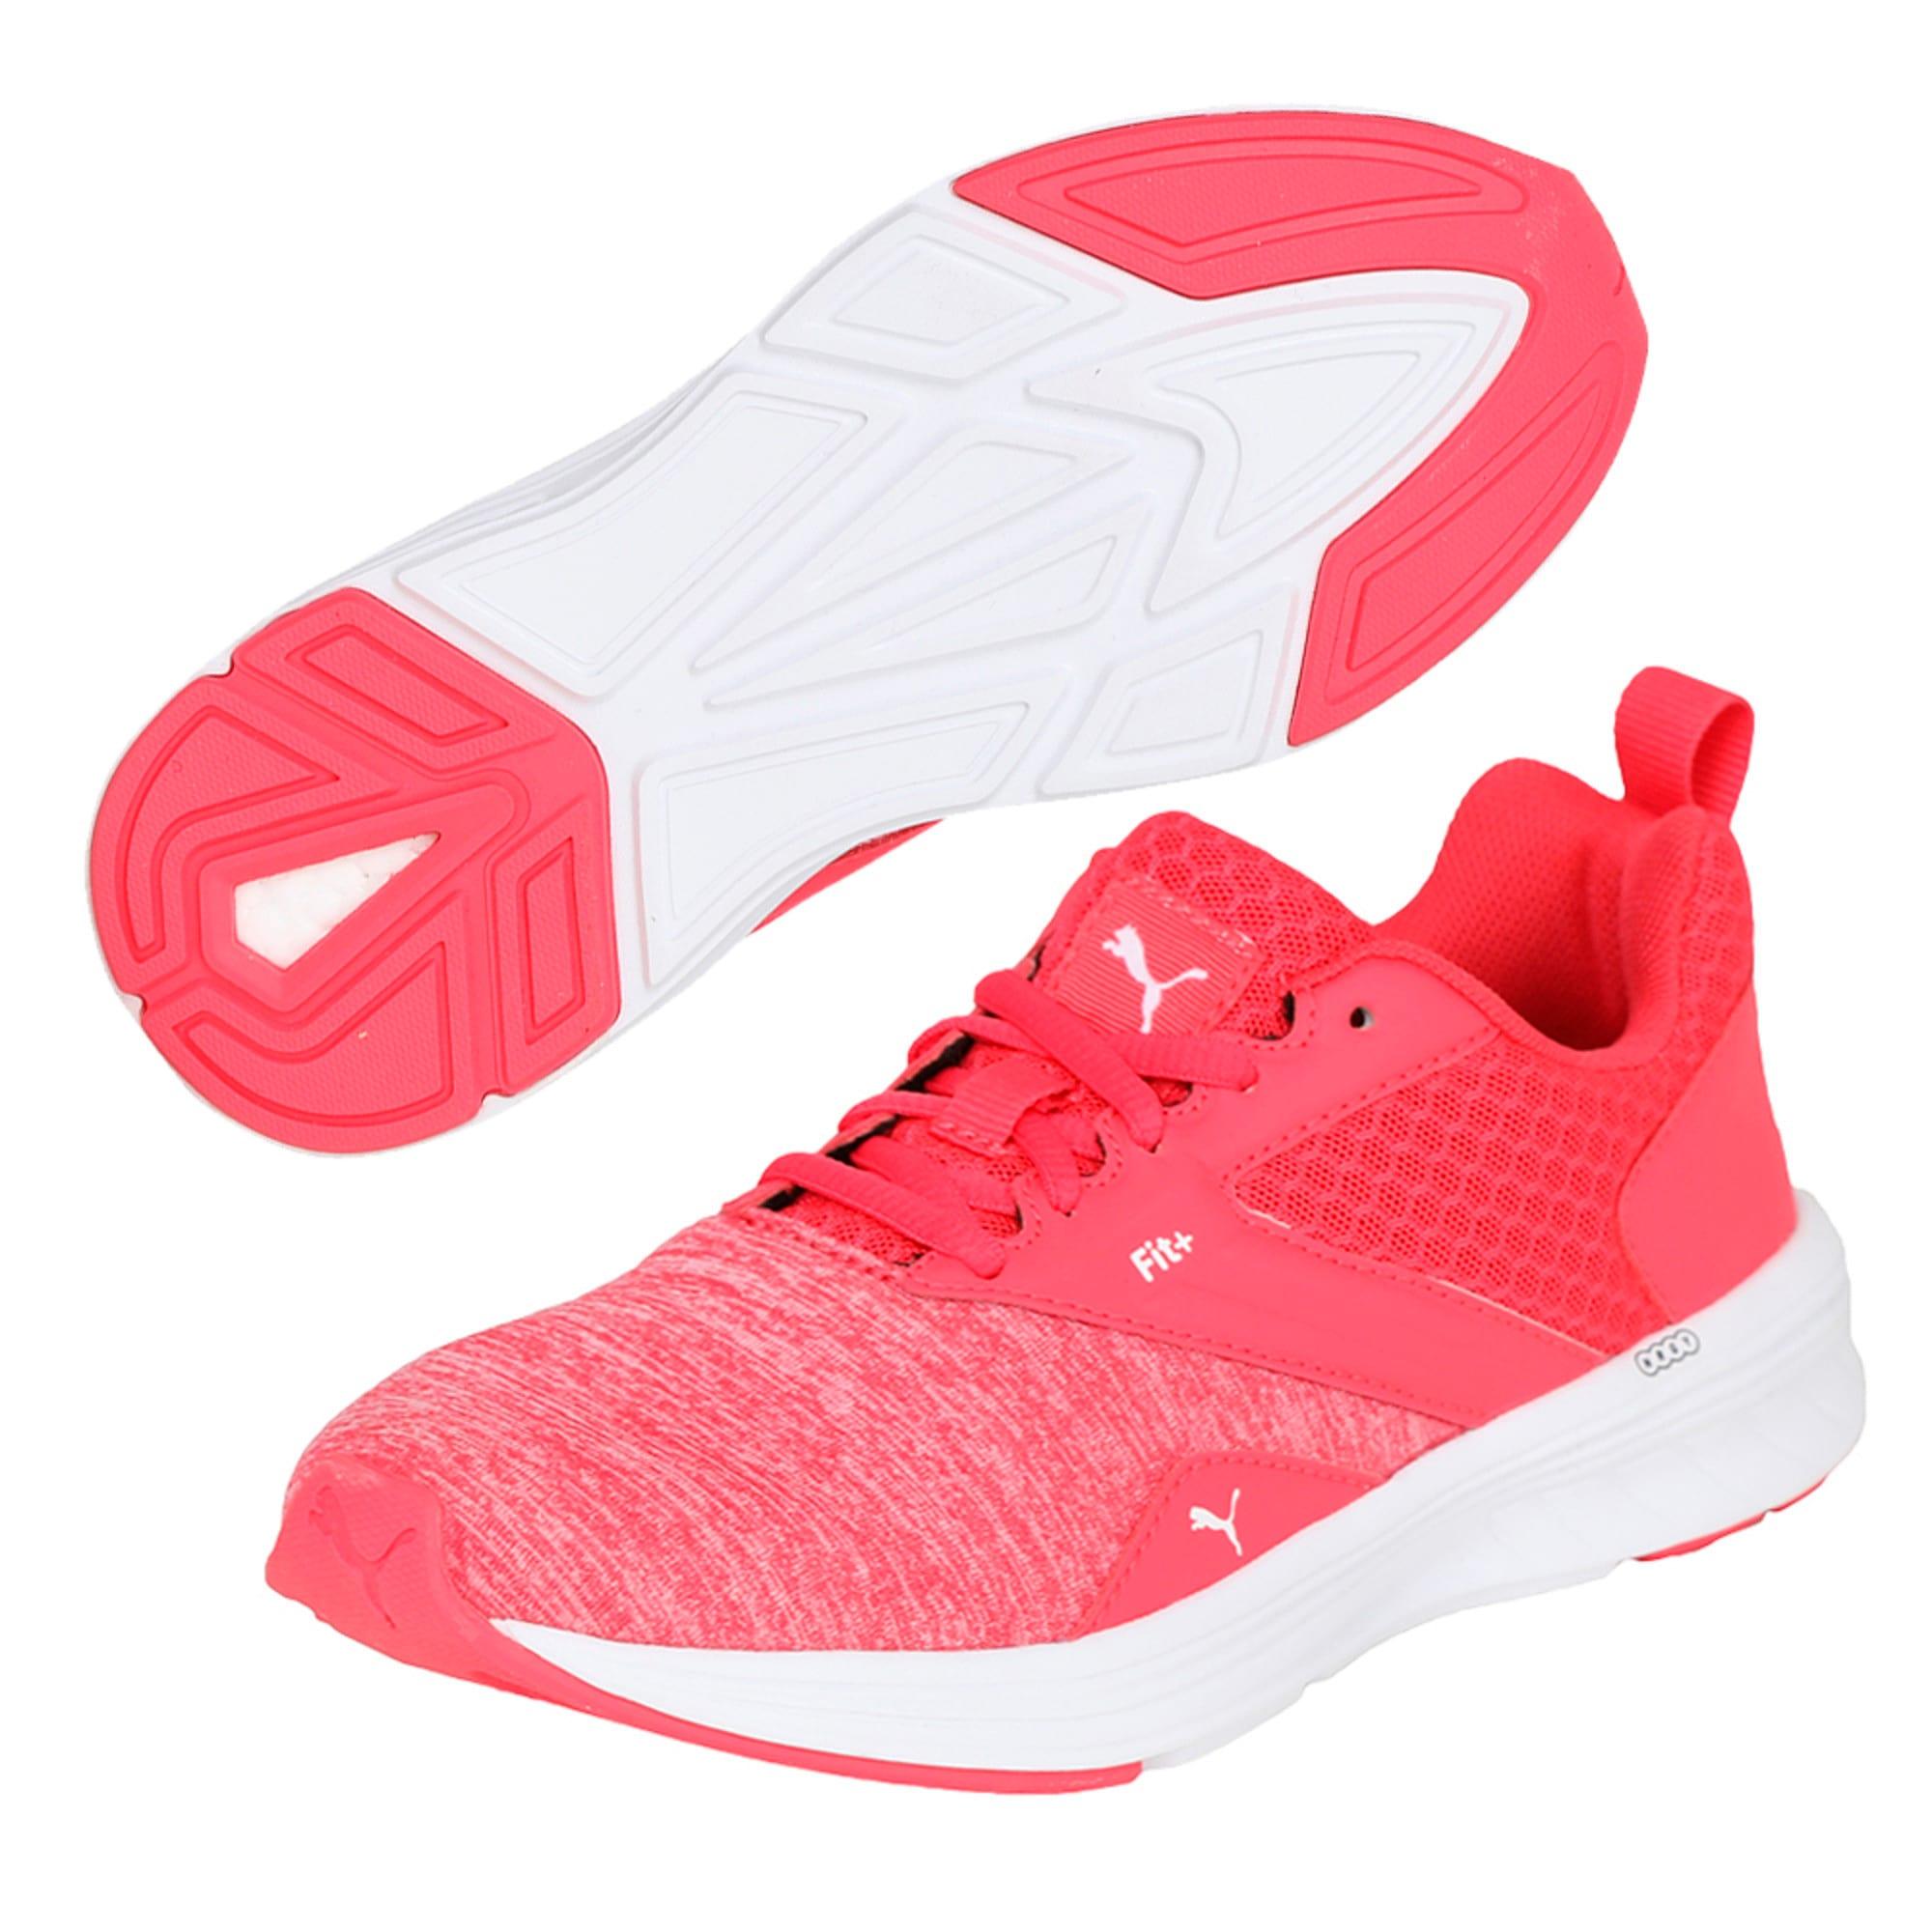 Thumbnail 6 of NRGY Comet Kids' Training Shoes, White-Paradise Pink-White, medium-IND